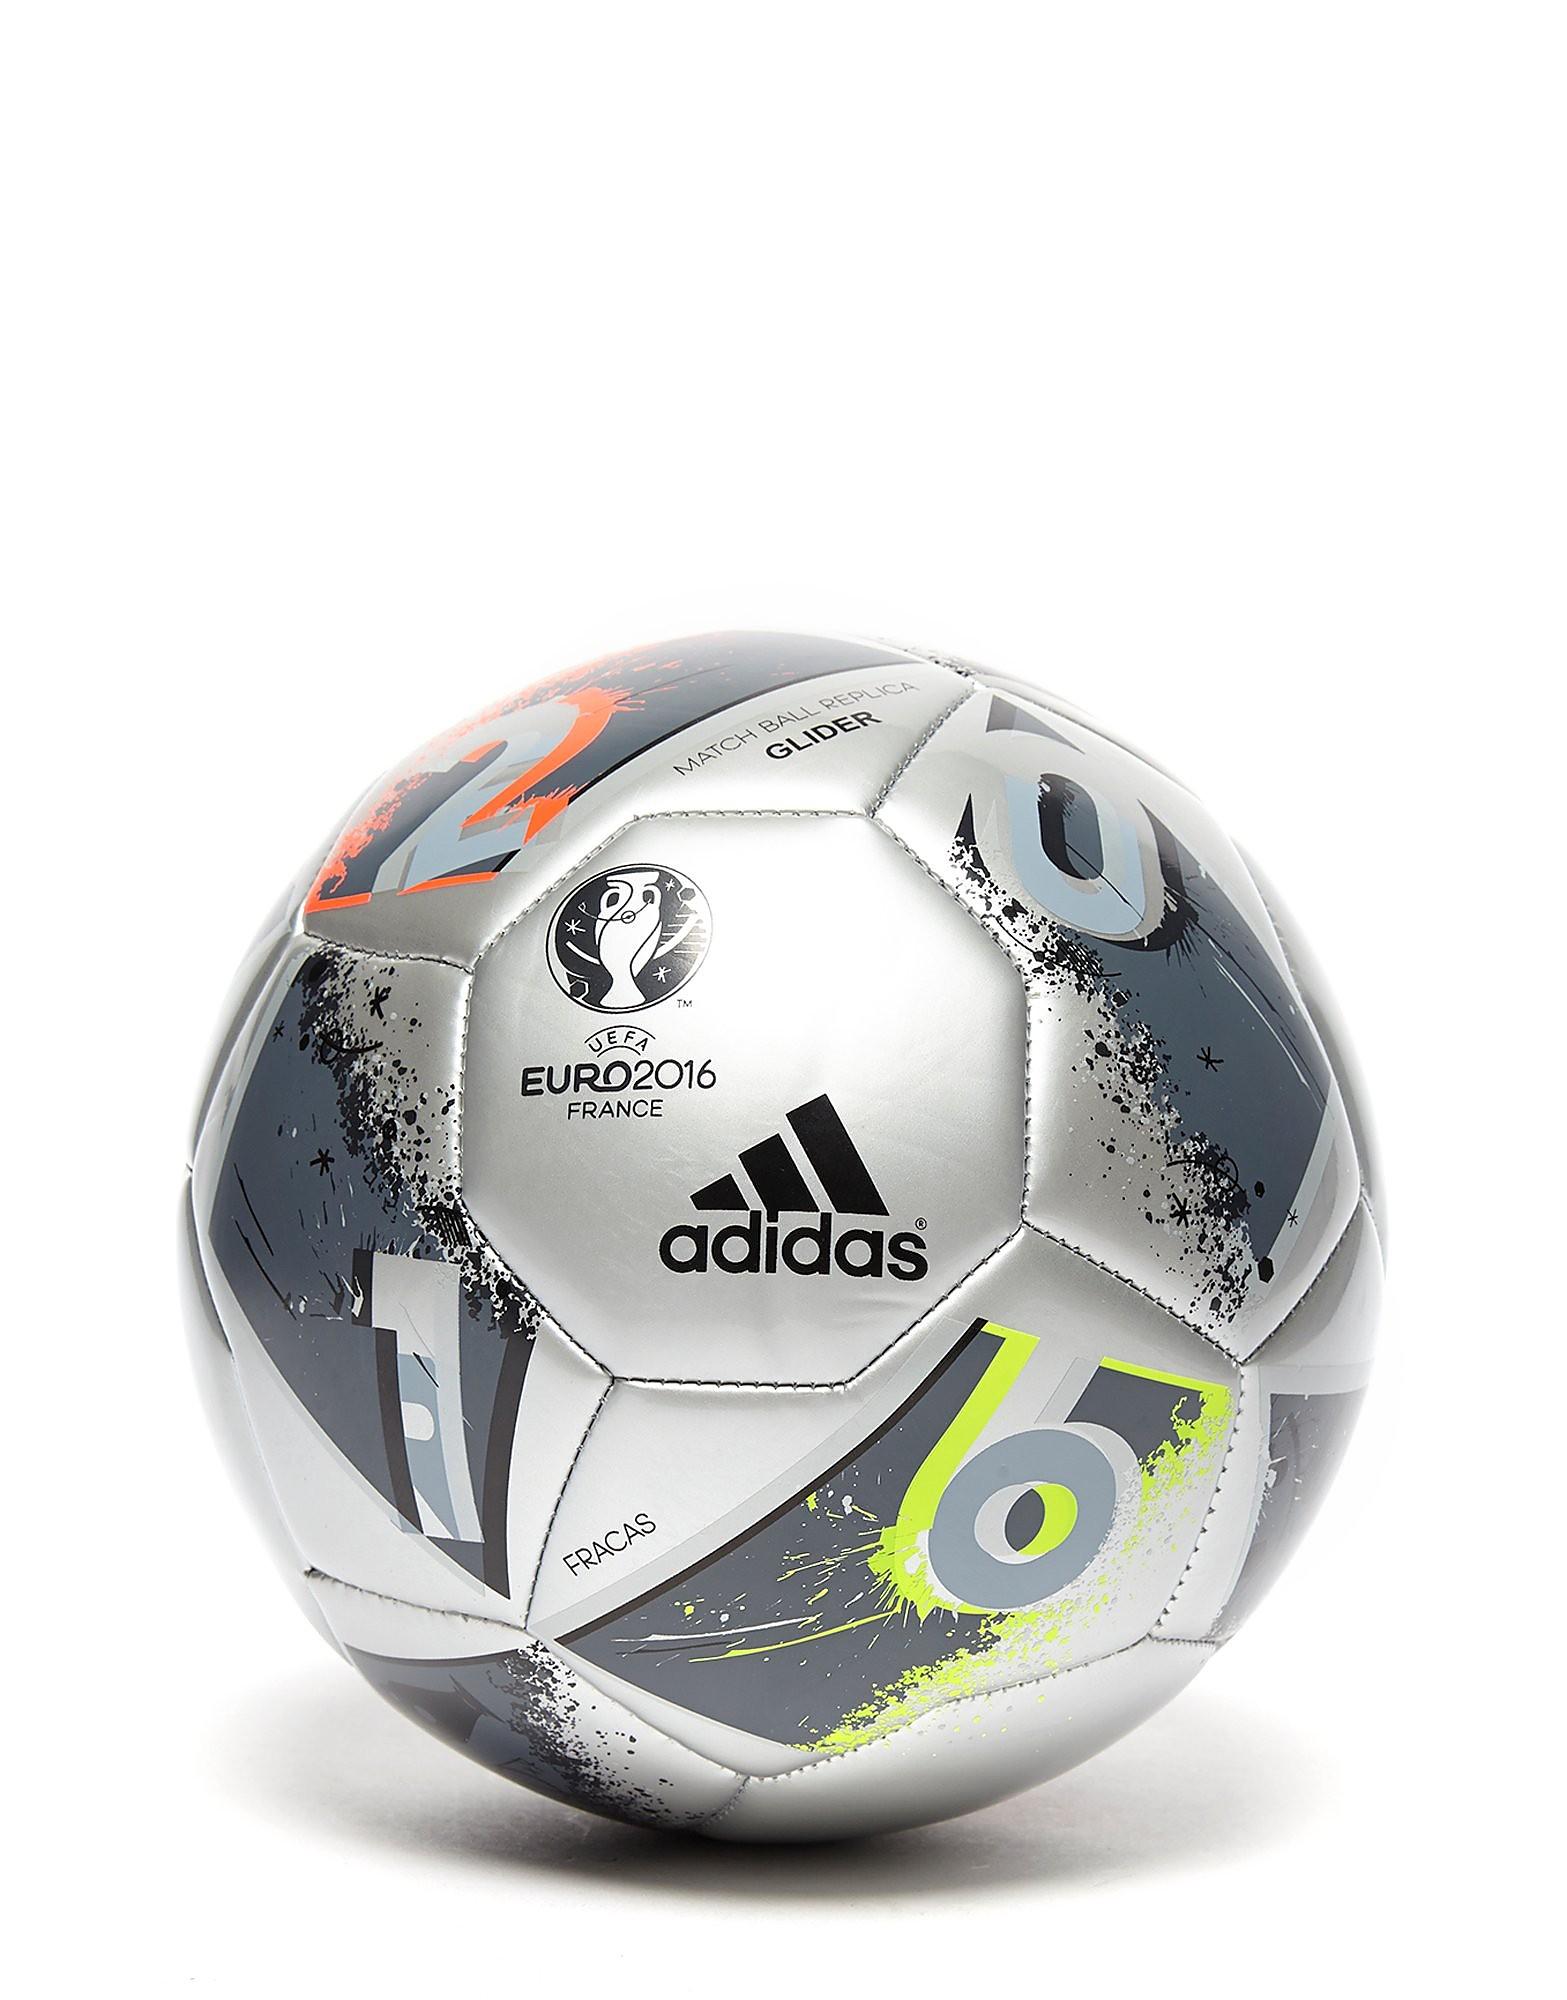 adidas Euro 2016 Final Glider Football